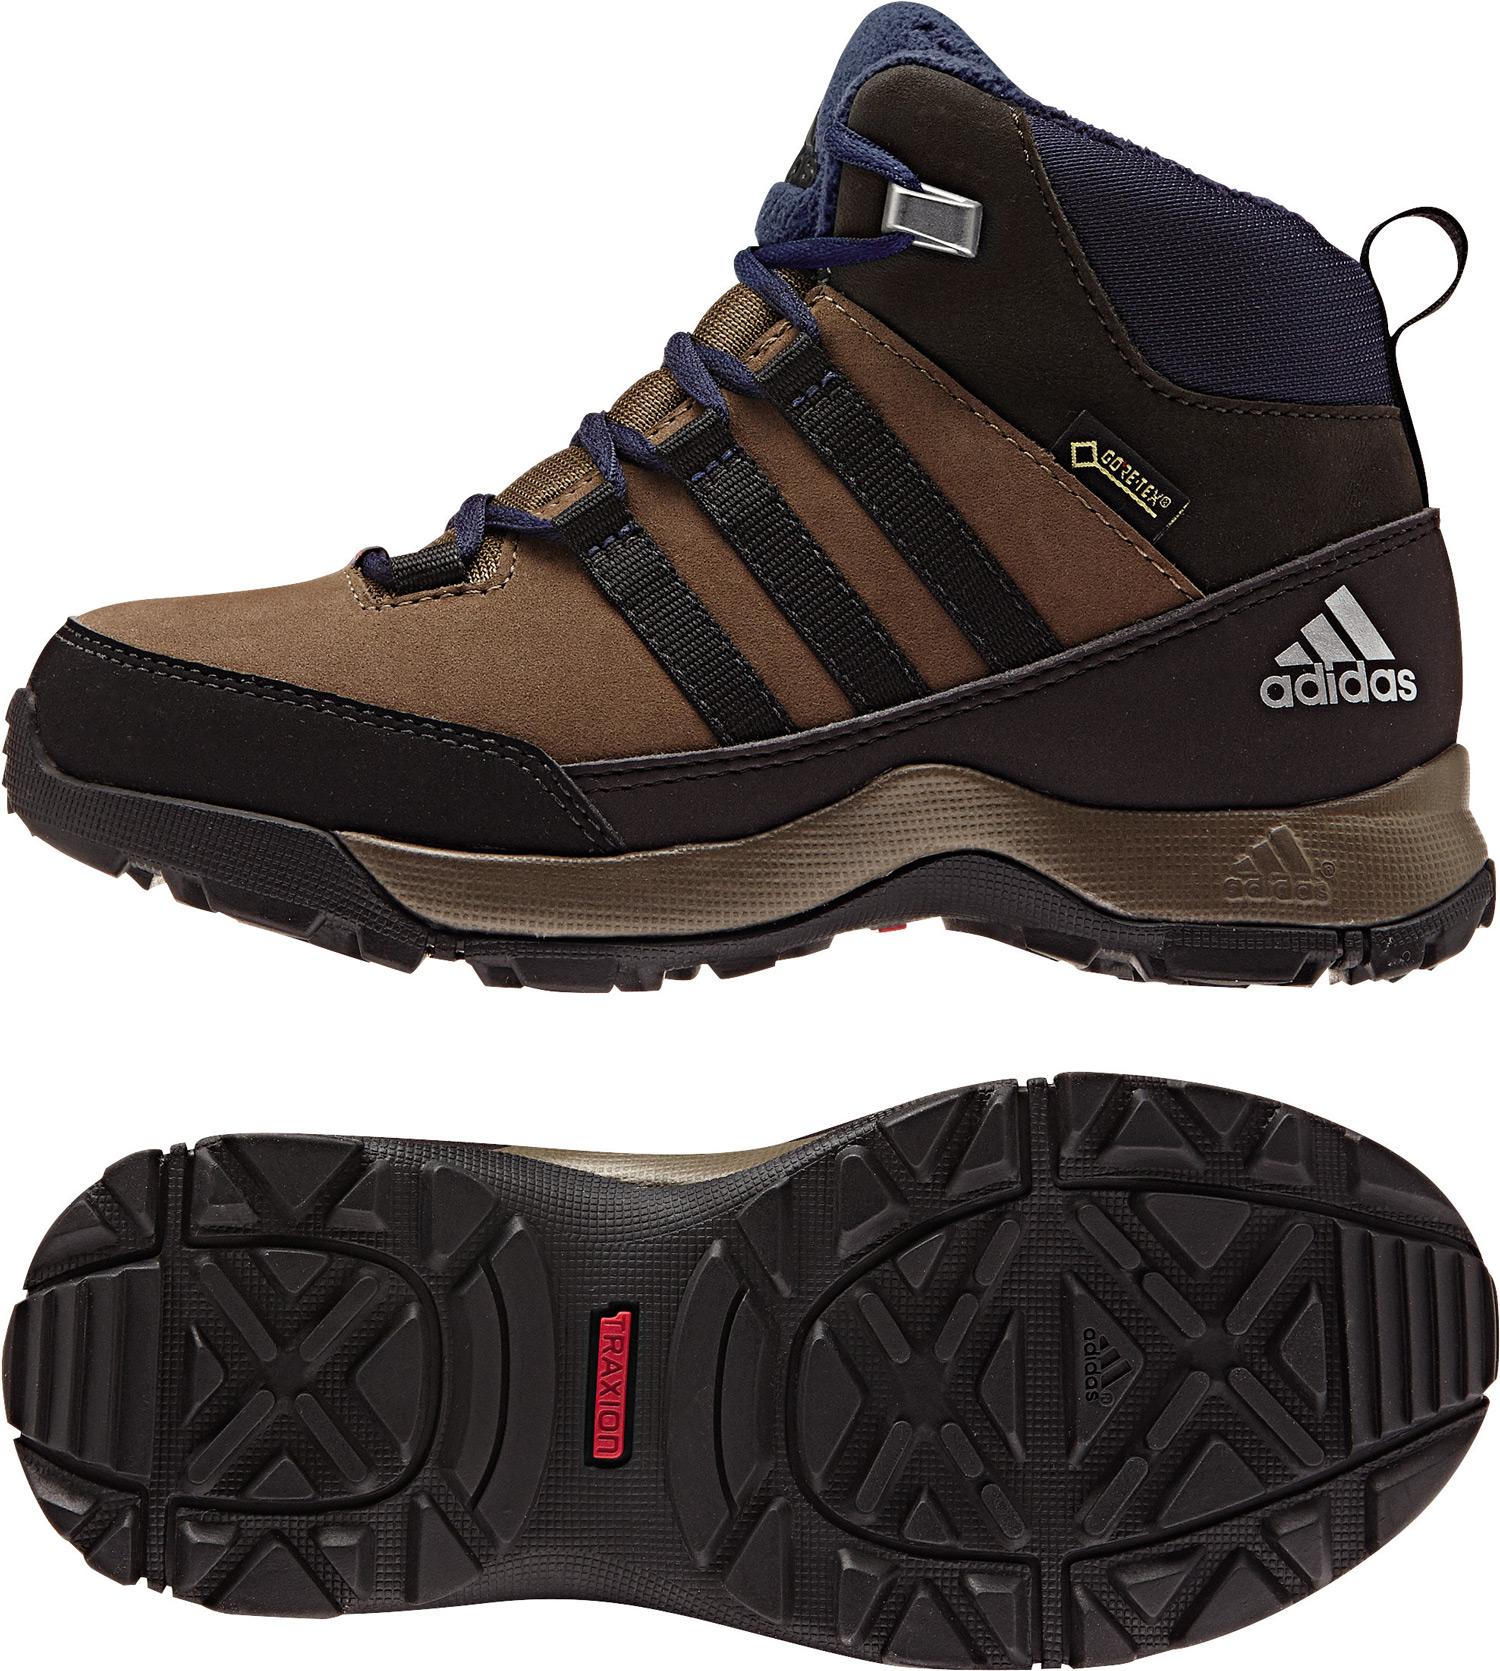 Kinder Outdoor-Schuhe Winter Hiker Mid GTX CW K